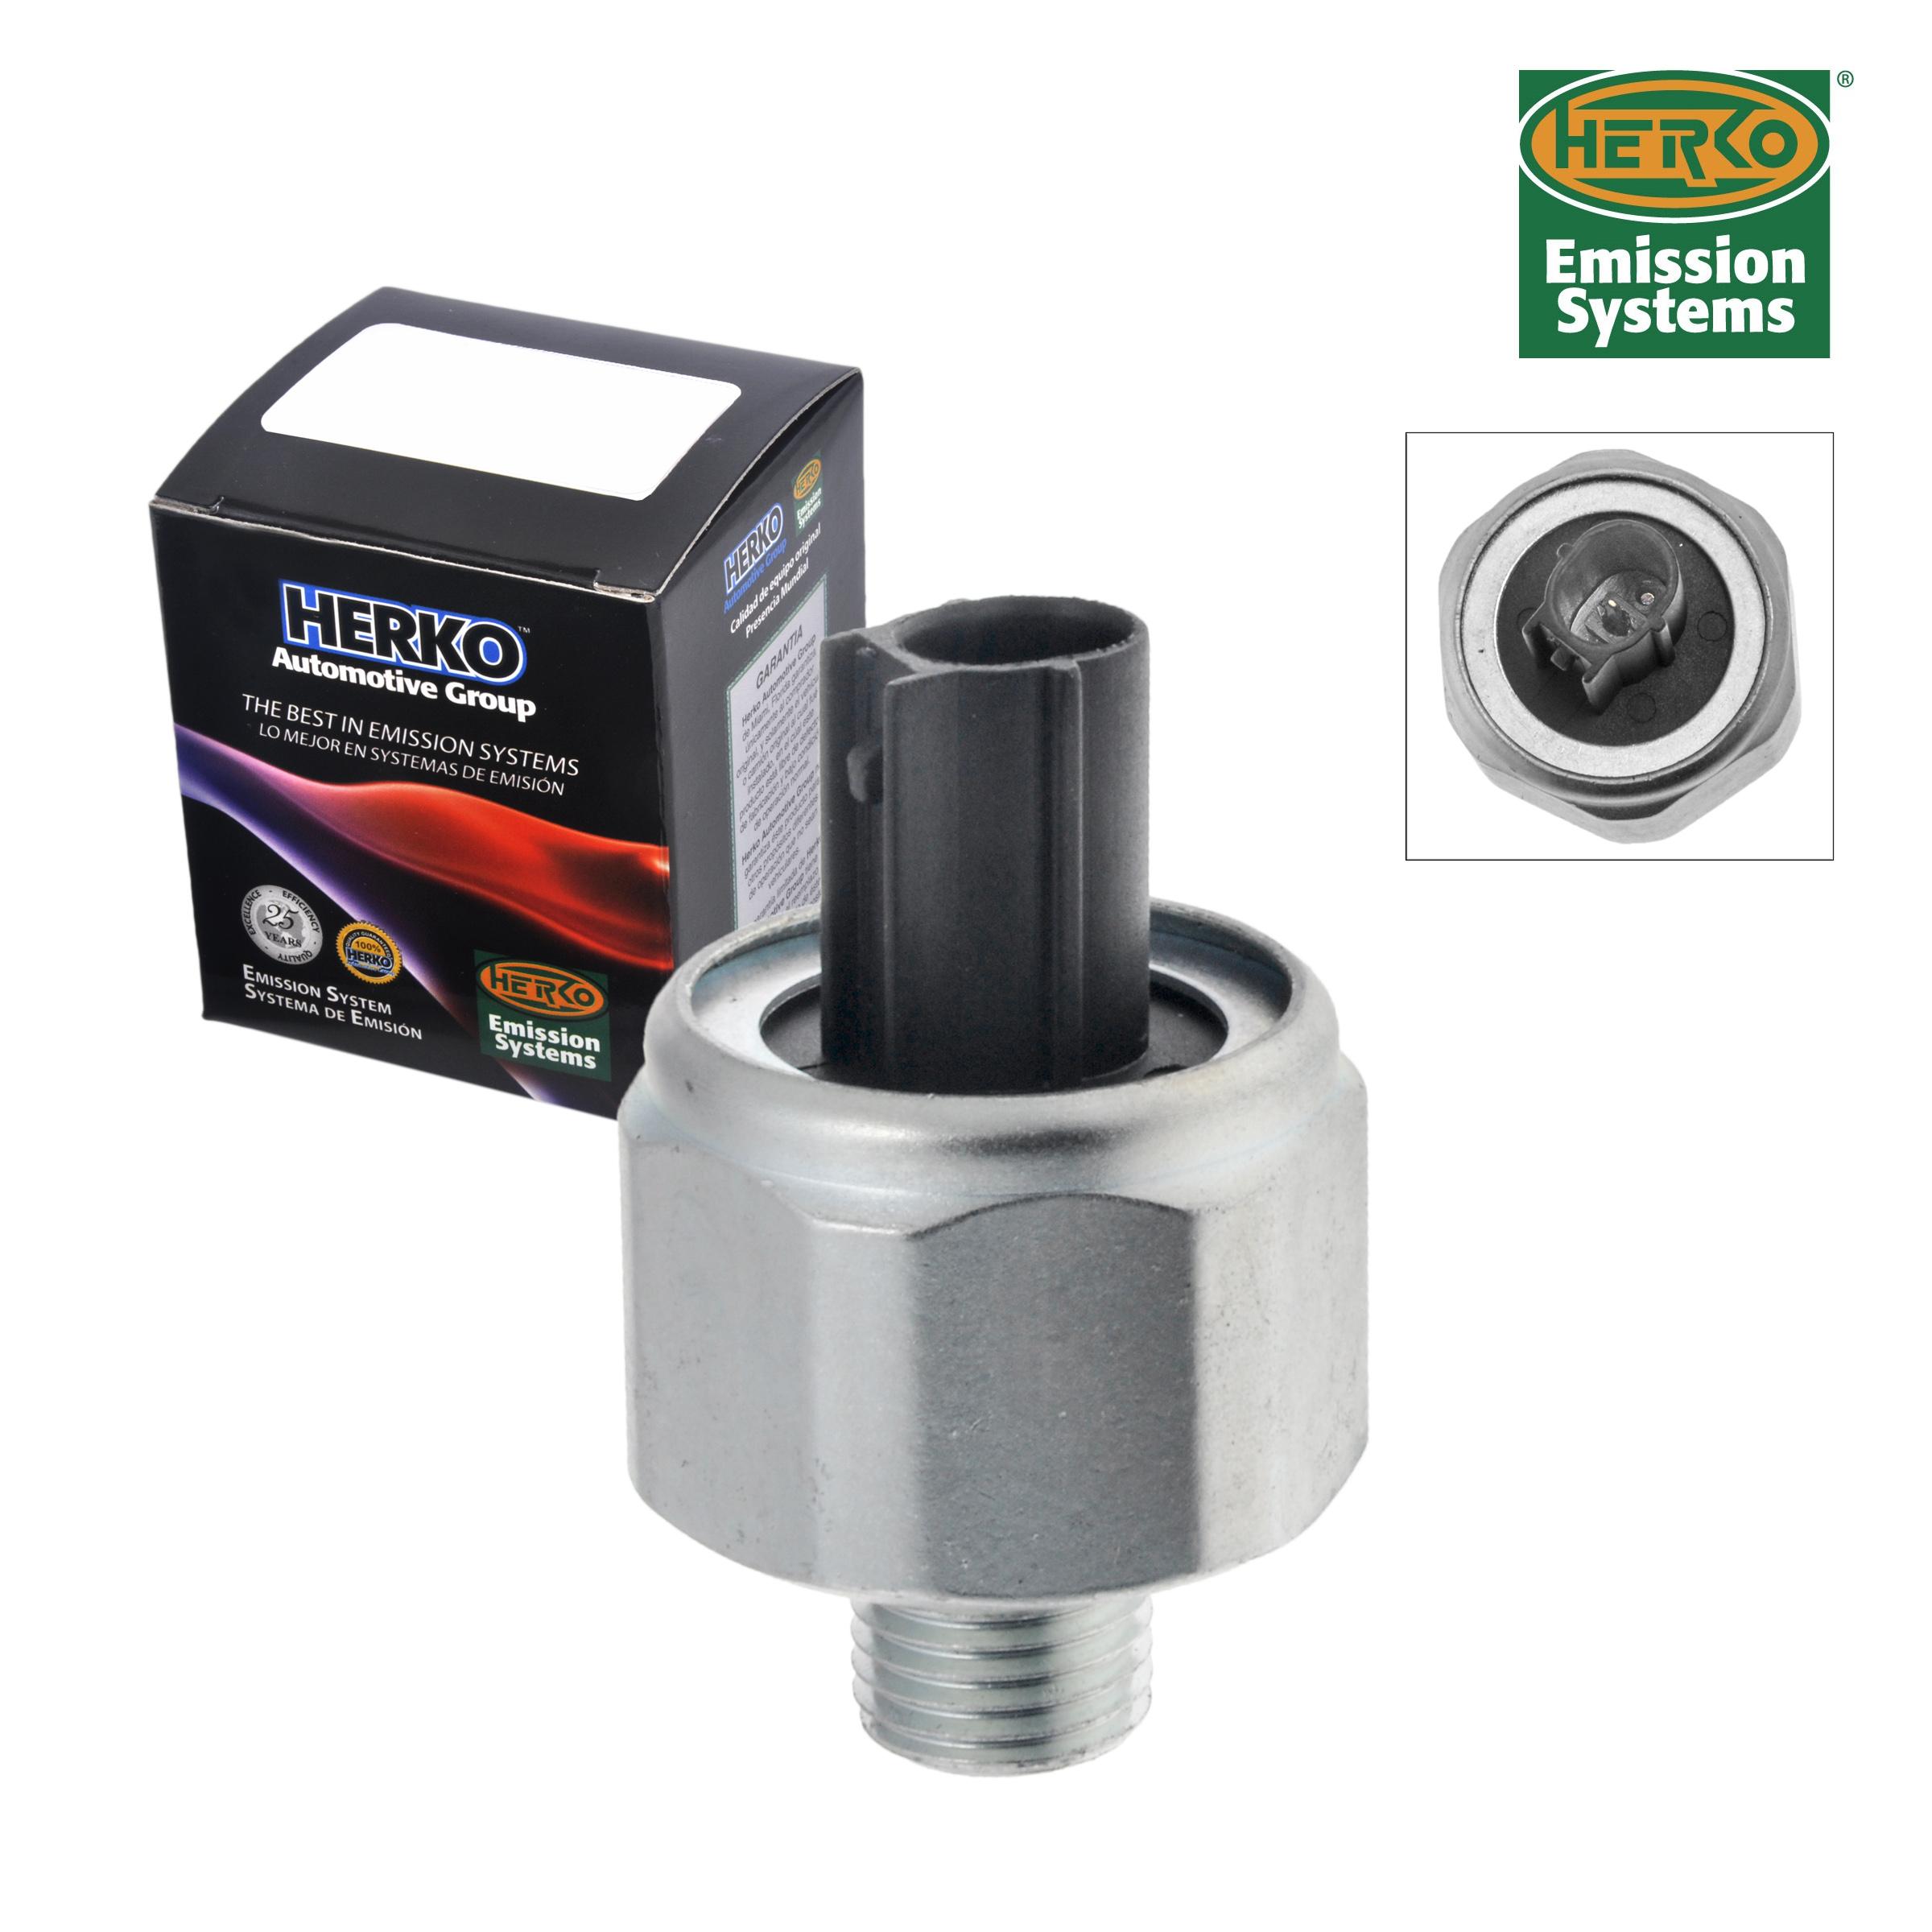 New Herko Premium KS5013 Knock Denotation Sensor